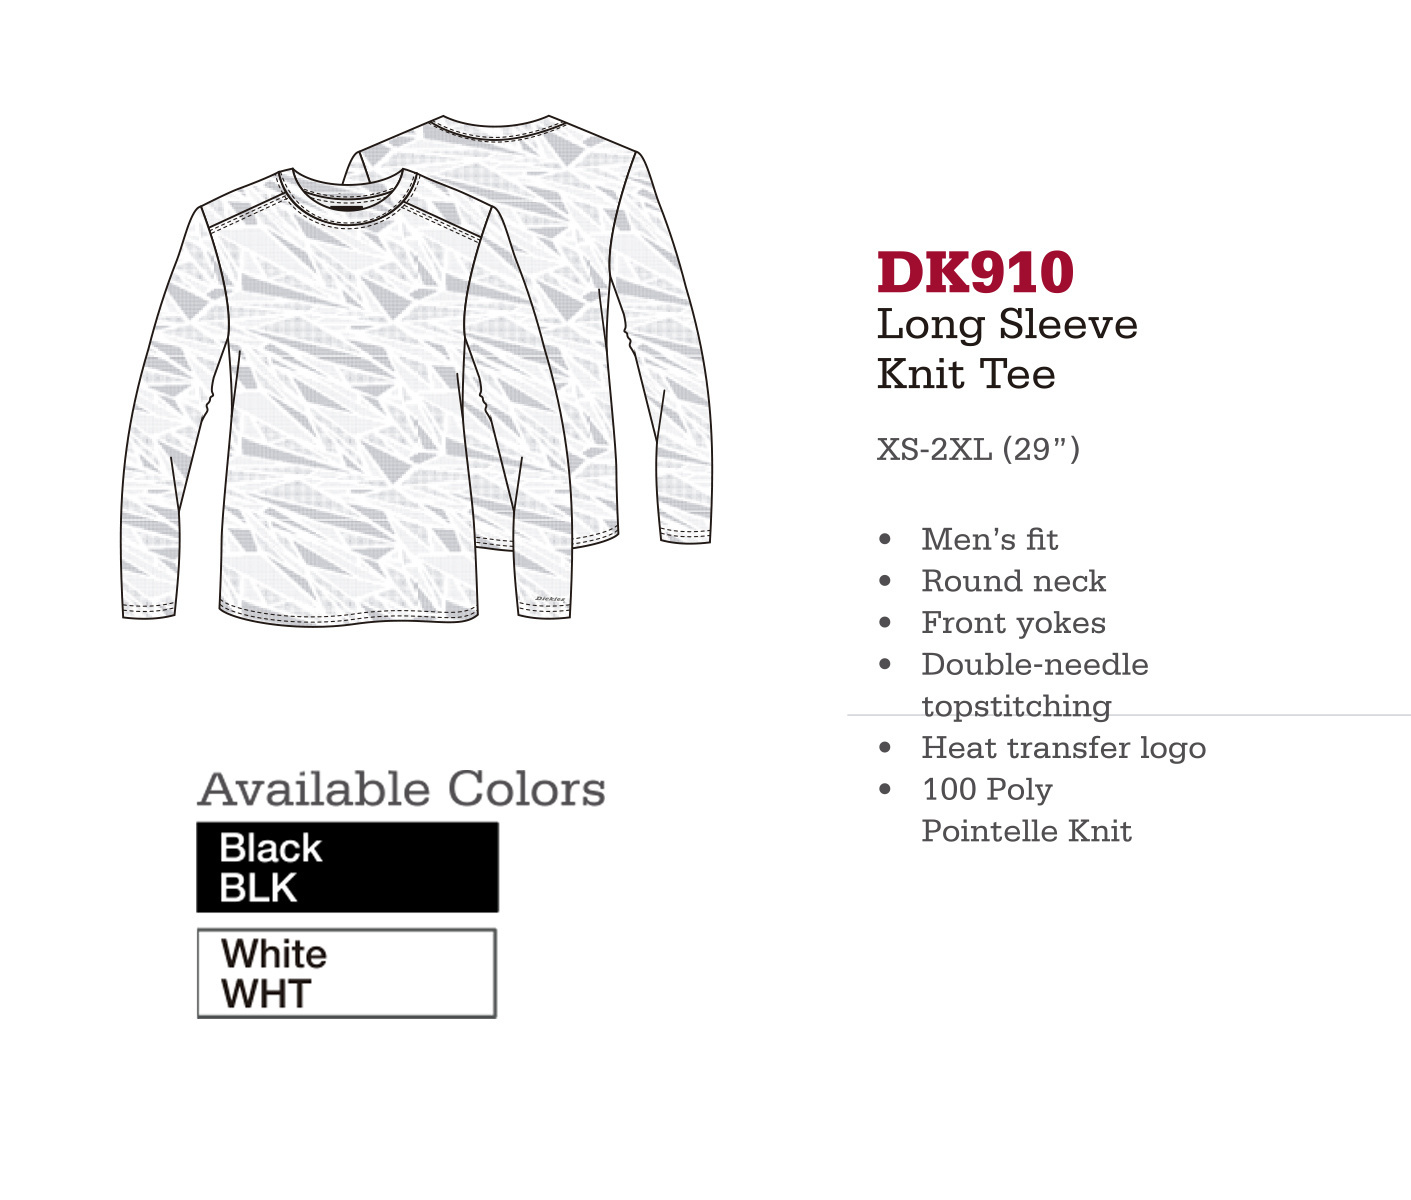 Camisa de Punto de Manga Larga. DK910.